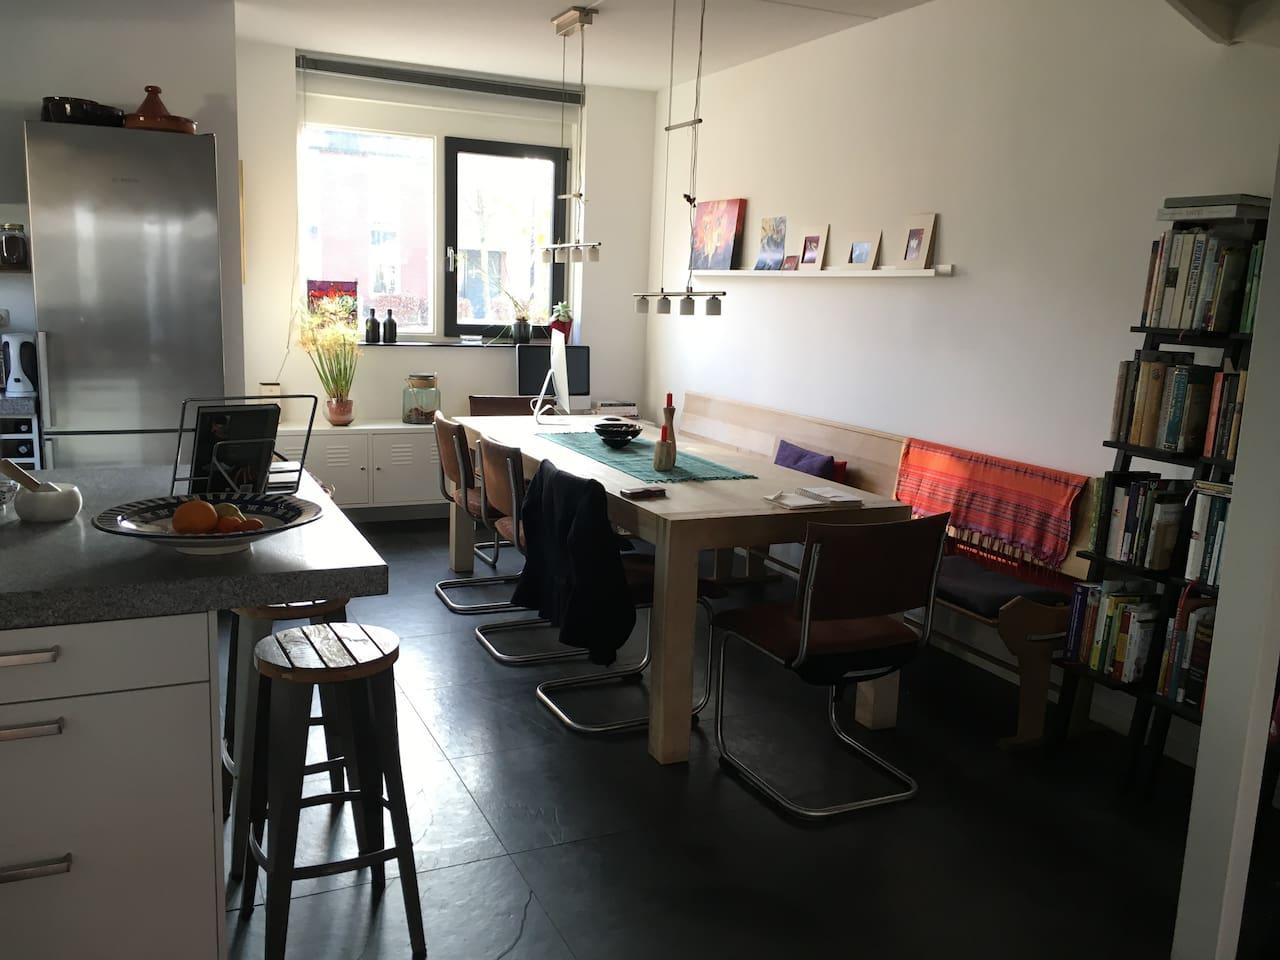 de eetkamer/kitchentable